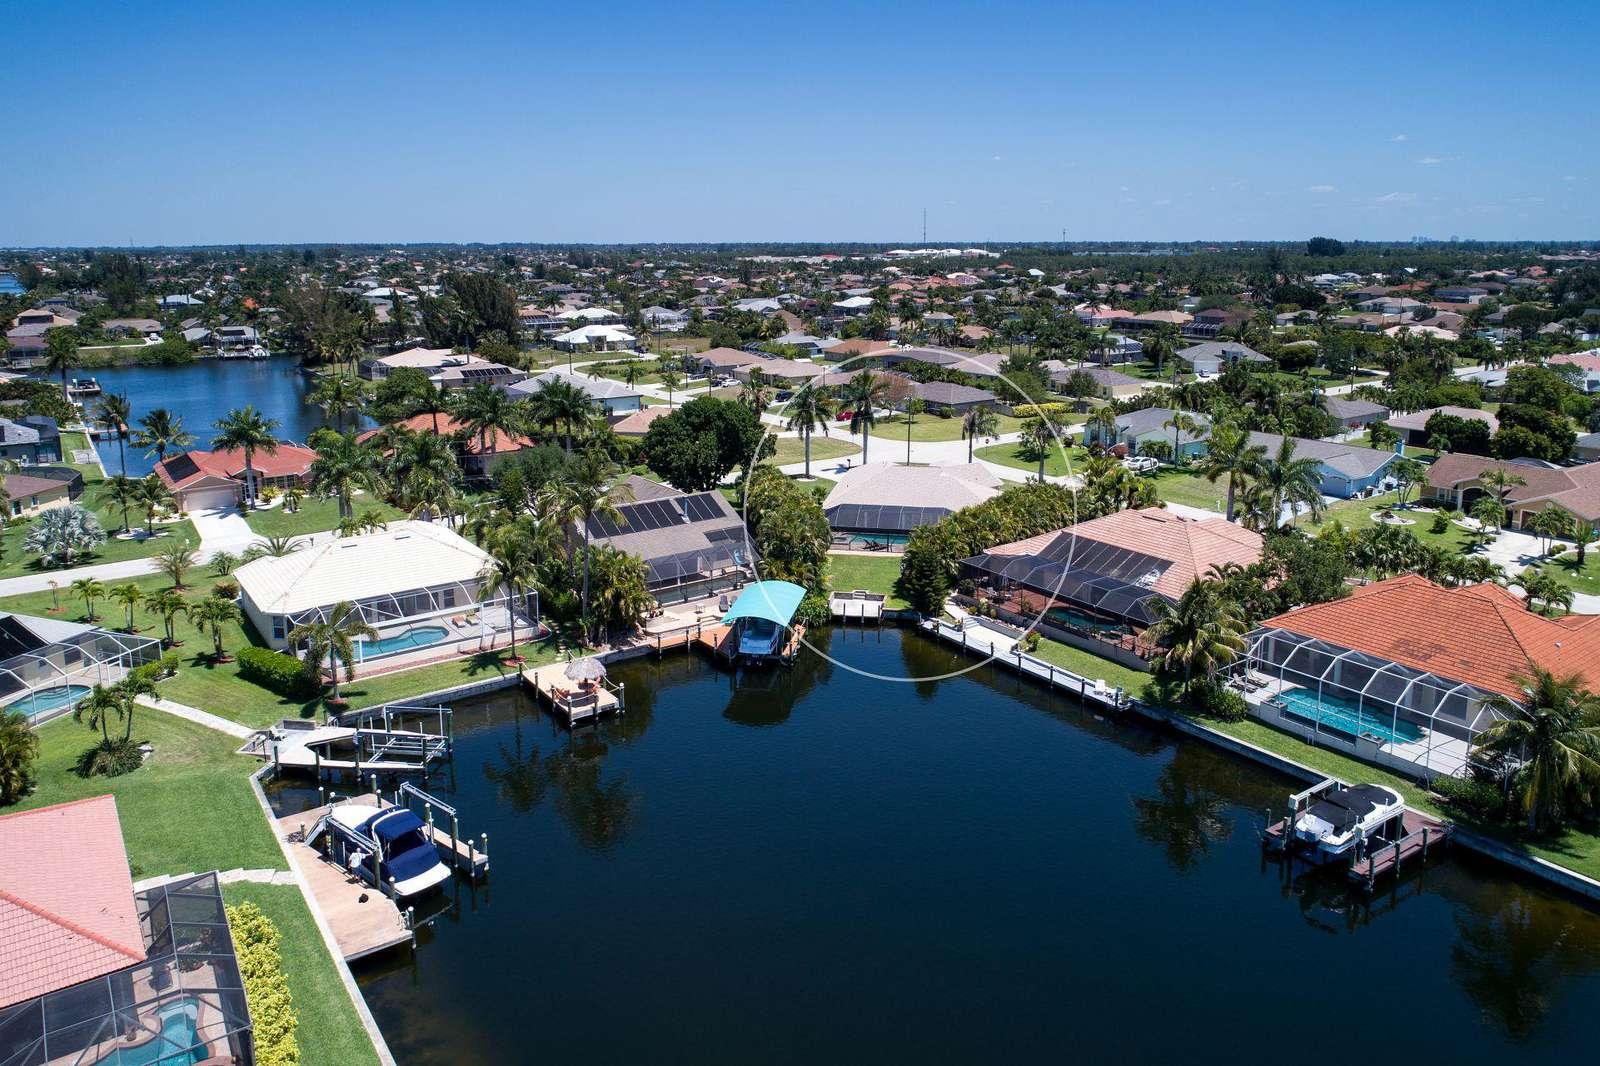 Wischis Florida Villa - Ferienhaus Cape Coral - Treasure Island - Hausverwaltung - Immobilien